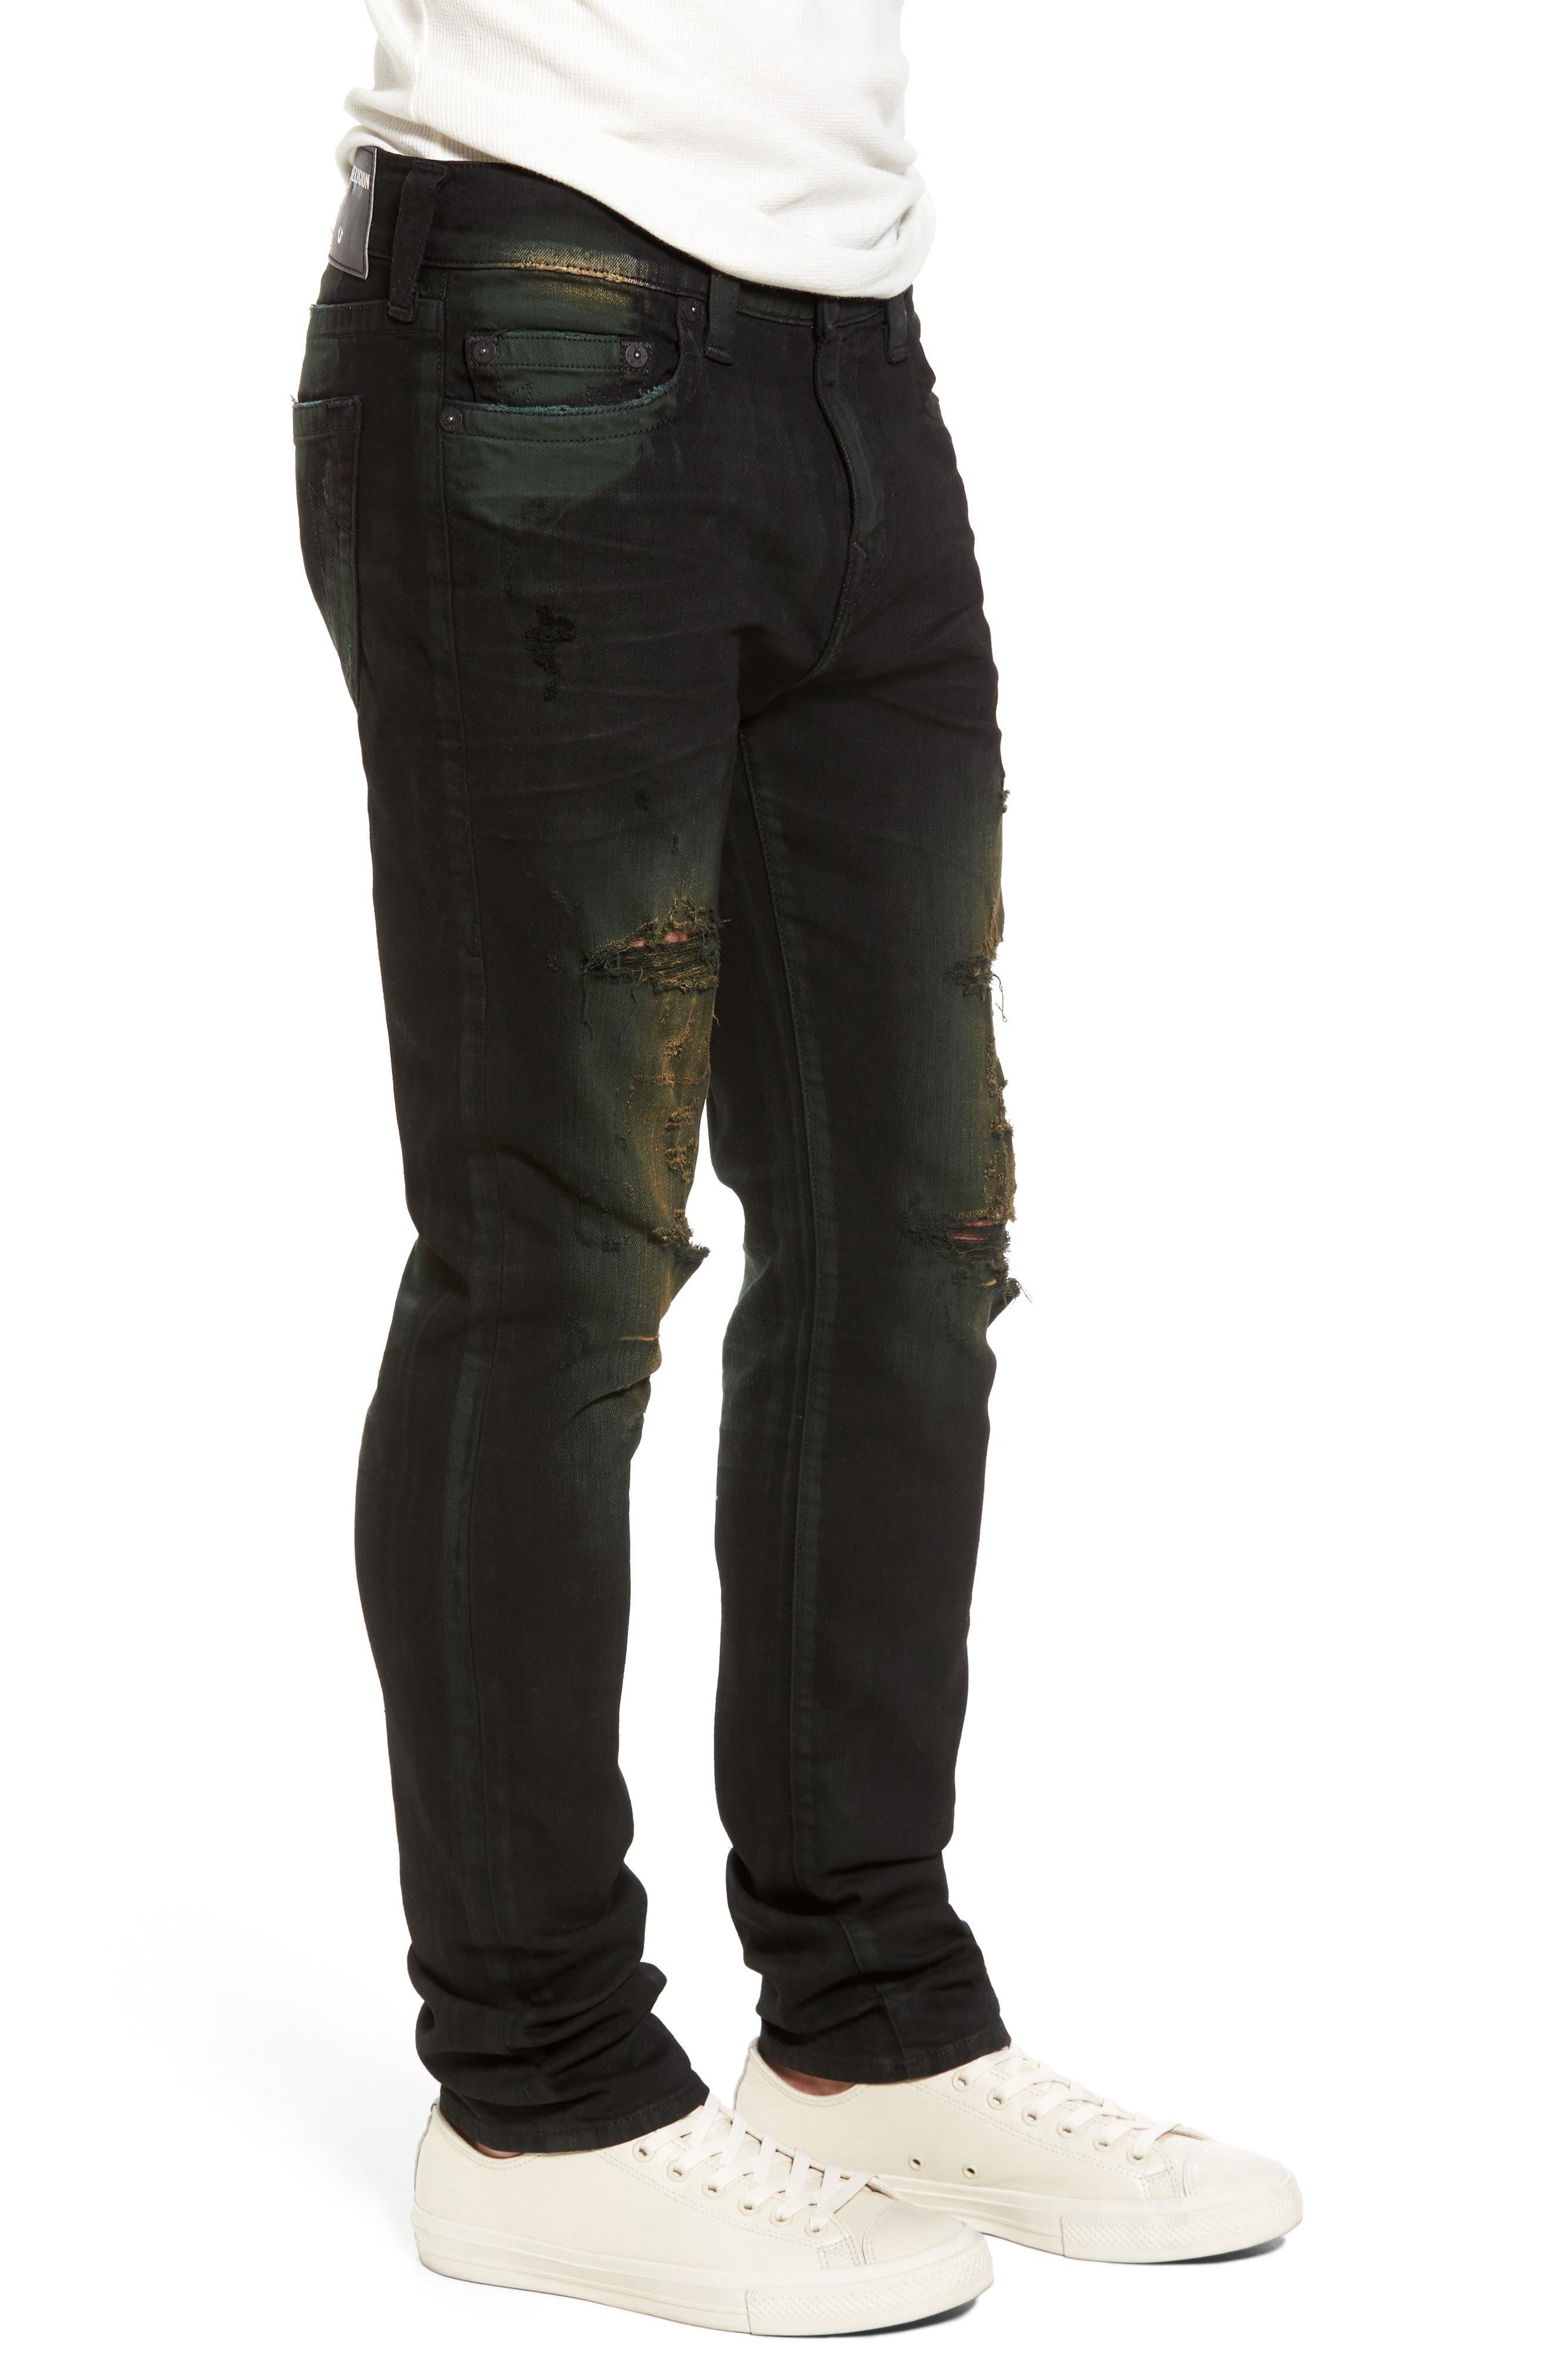 Alternate Image 3  - True Religion Brand Jeans Rocco Skinny Fit Jeans (Green Blaze)